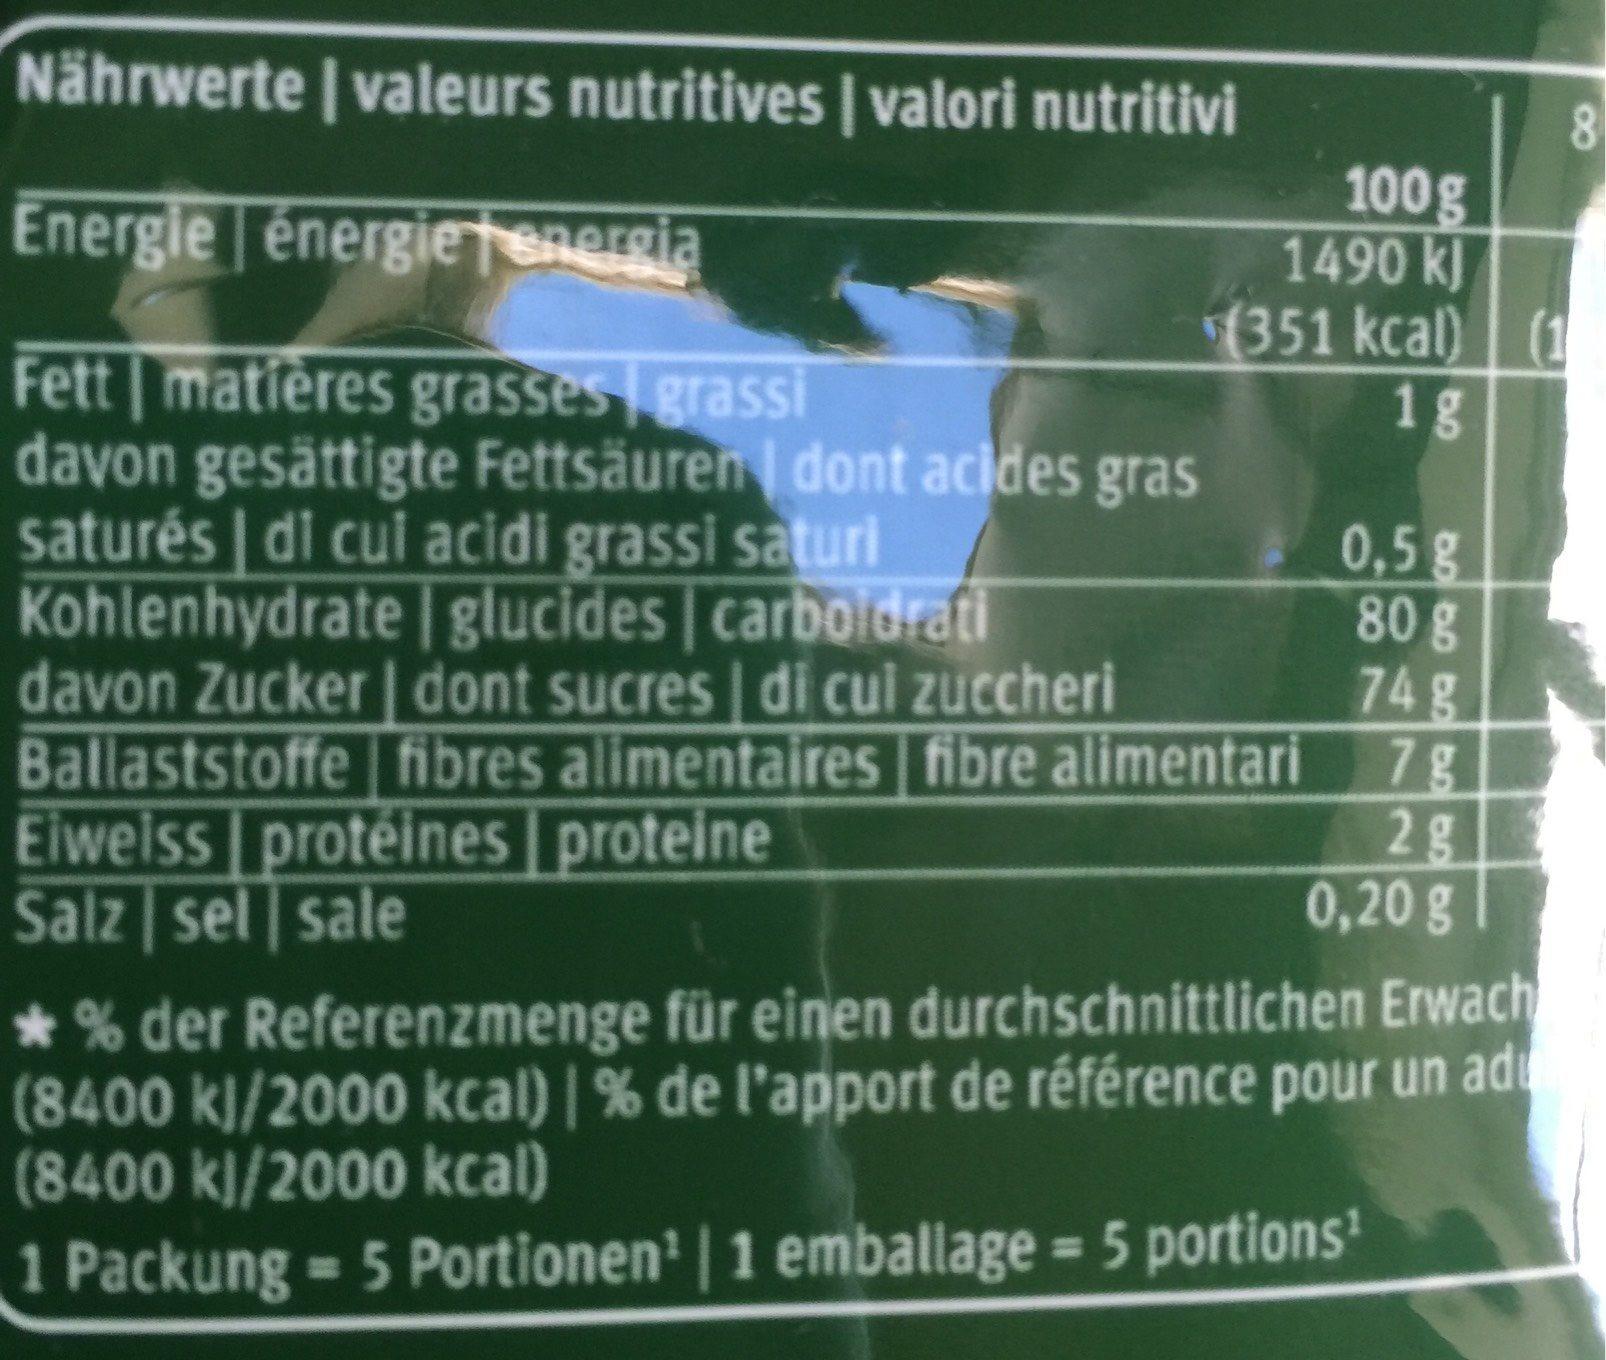 Mangoschnitze Getrocknet - Informations nutritionnelles - fr